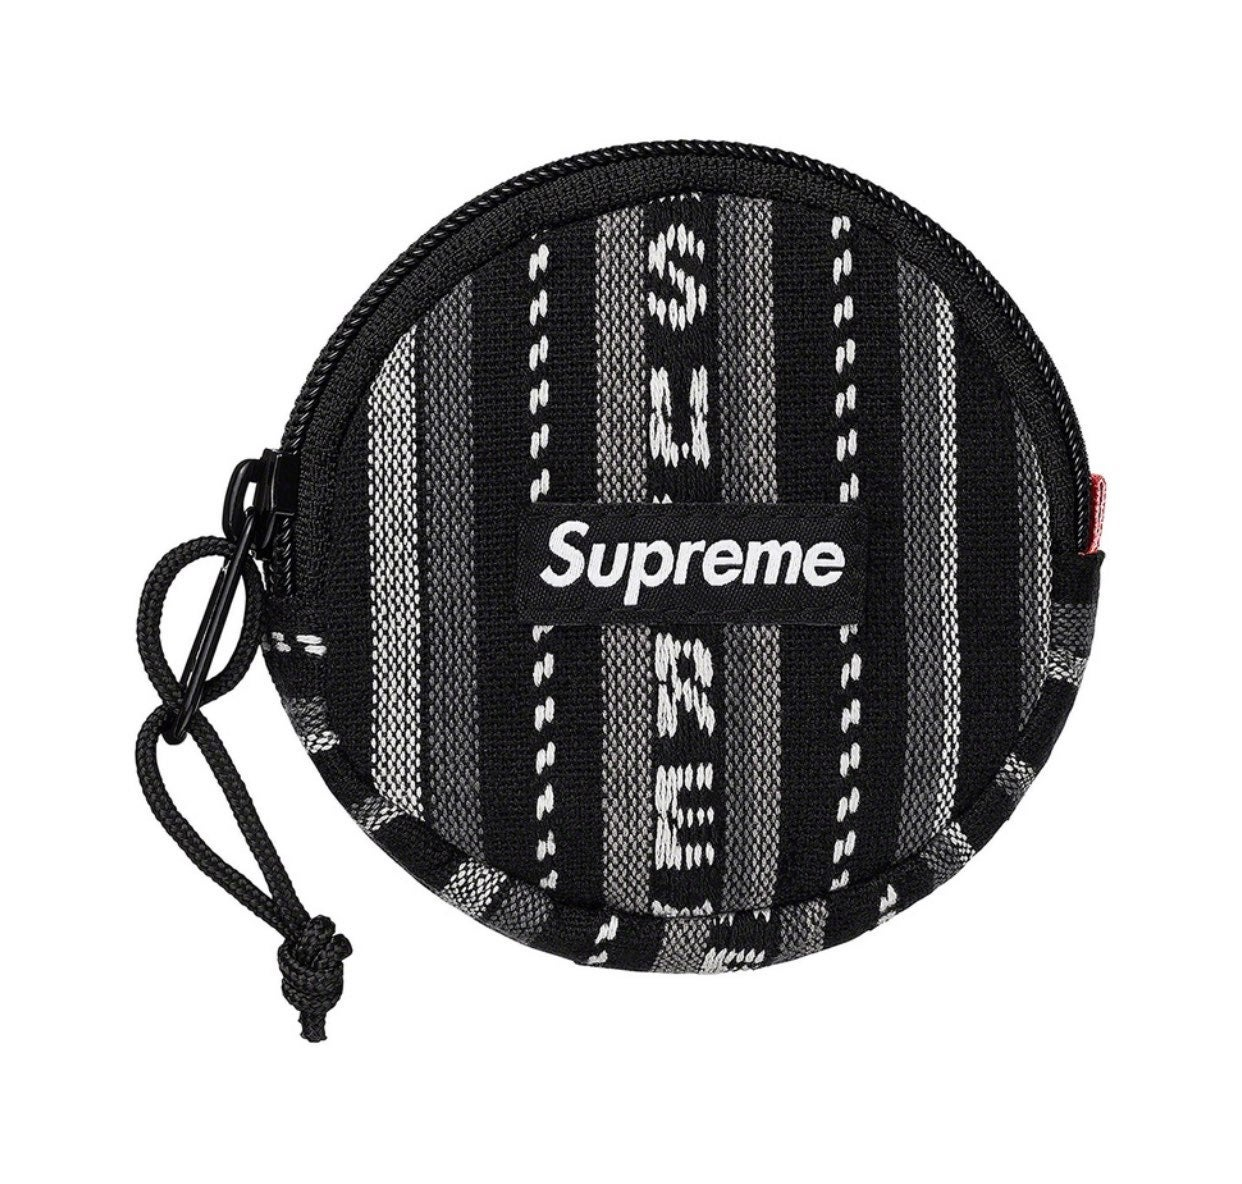 Supreme Woven Coin pouch